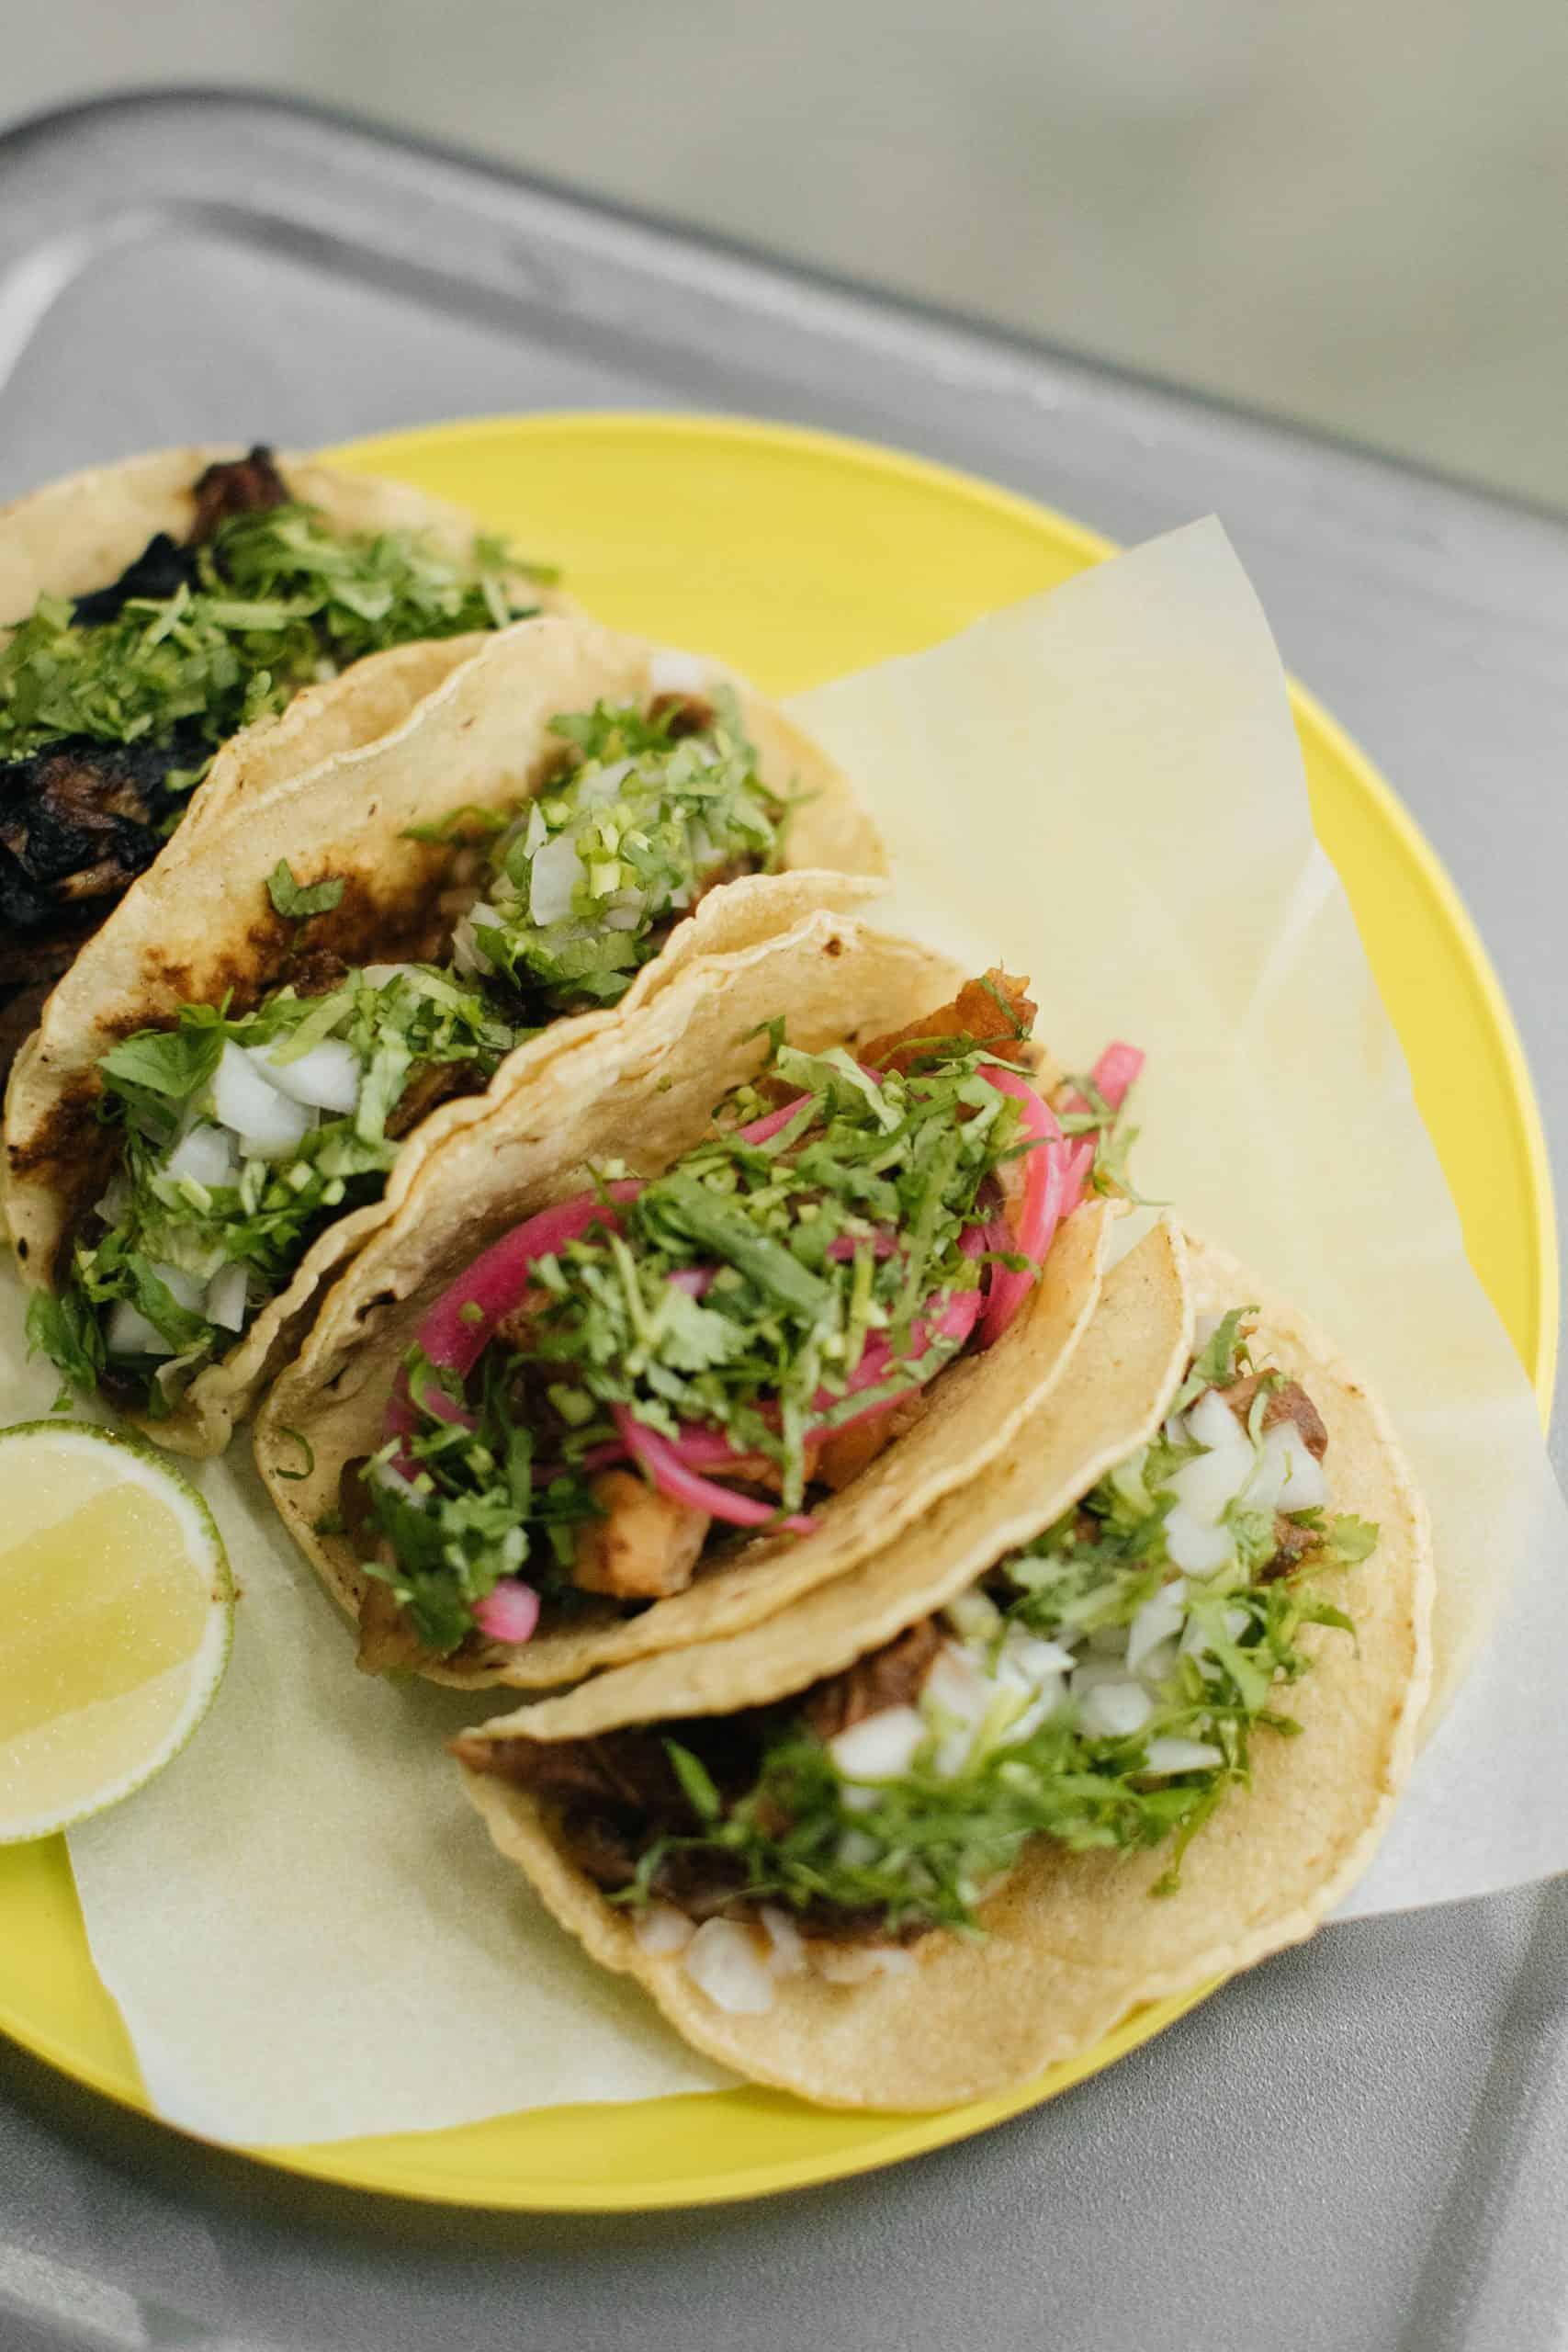 Tacos Padre Carne Asada tacos recipe | Photo: Maureen Evans